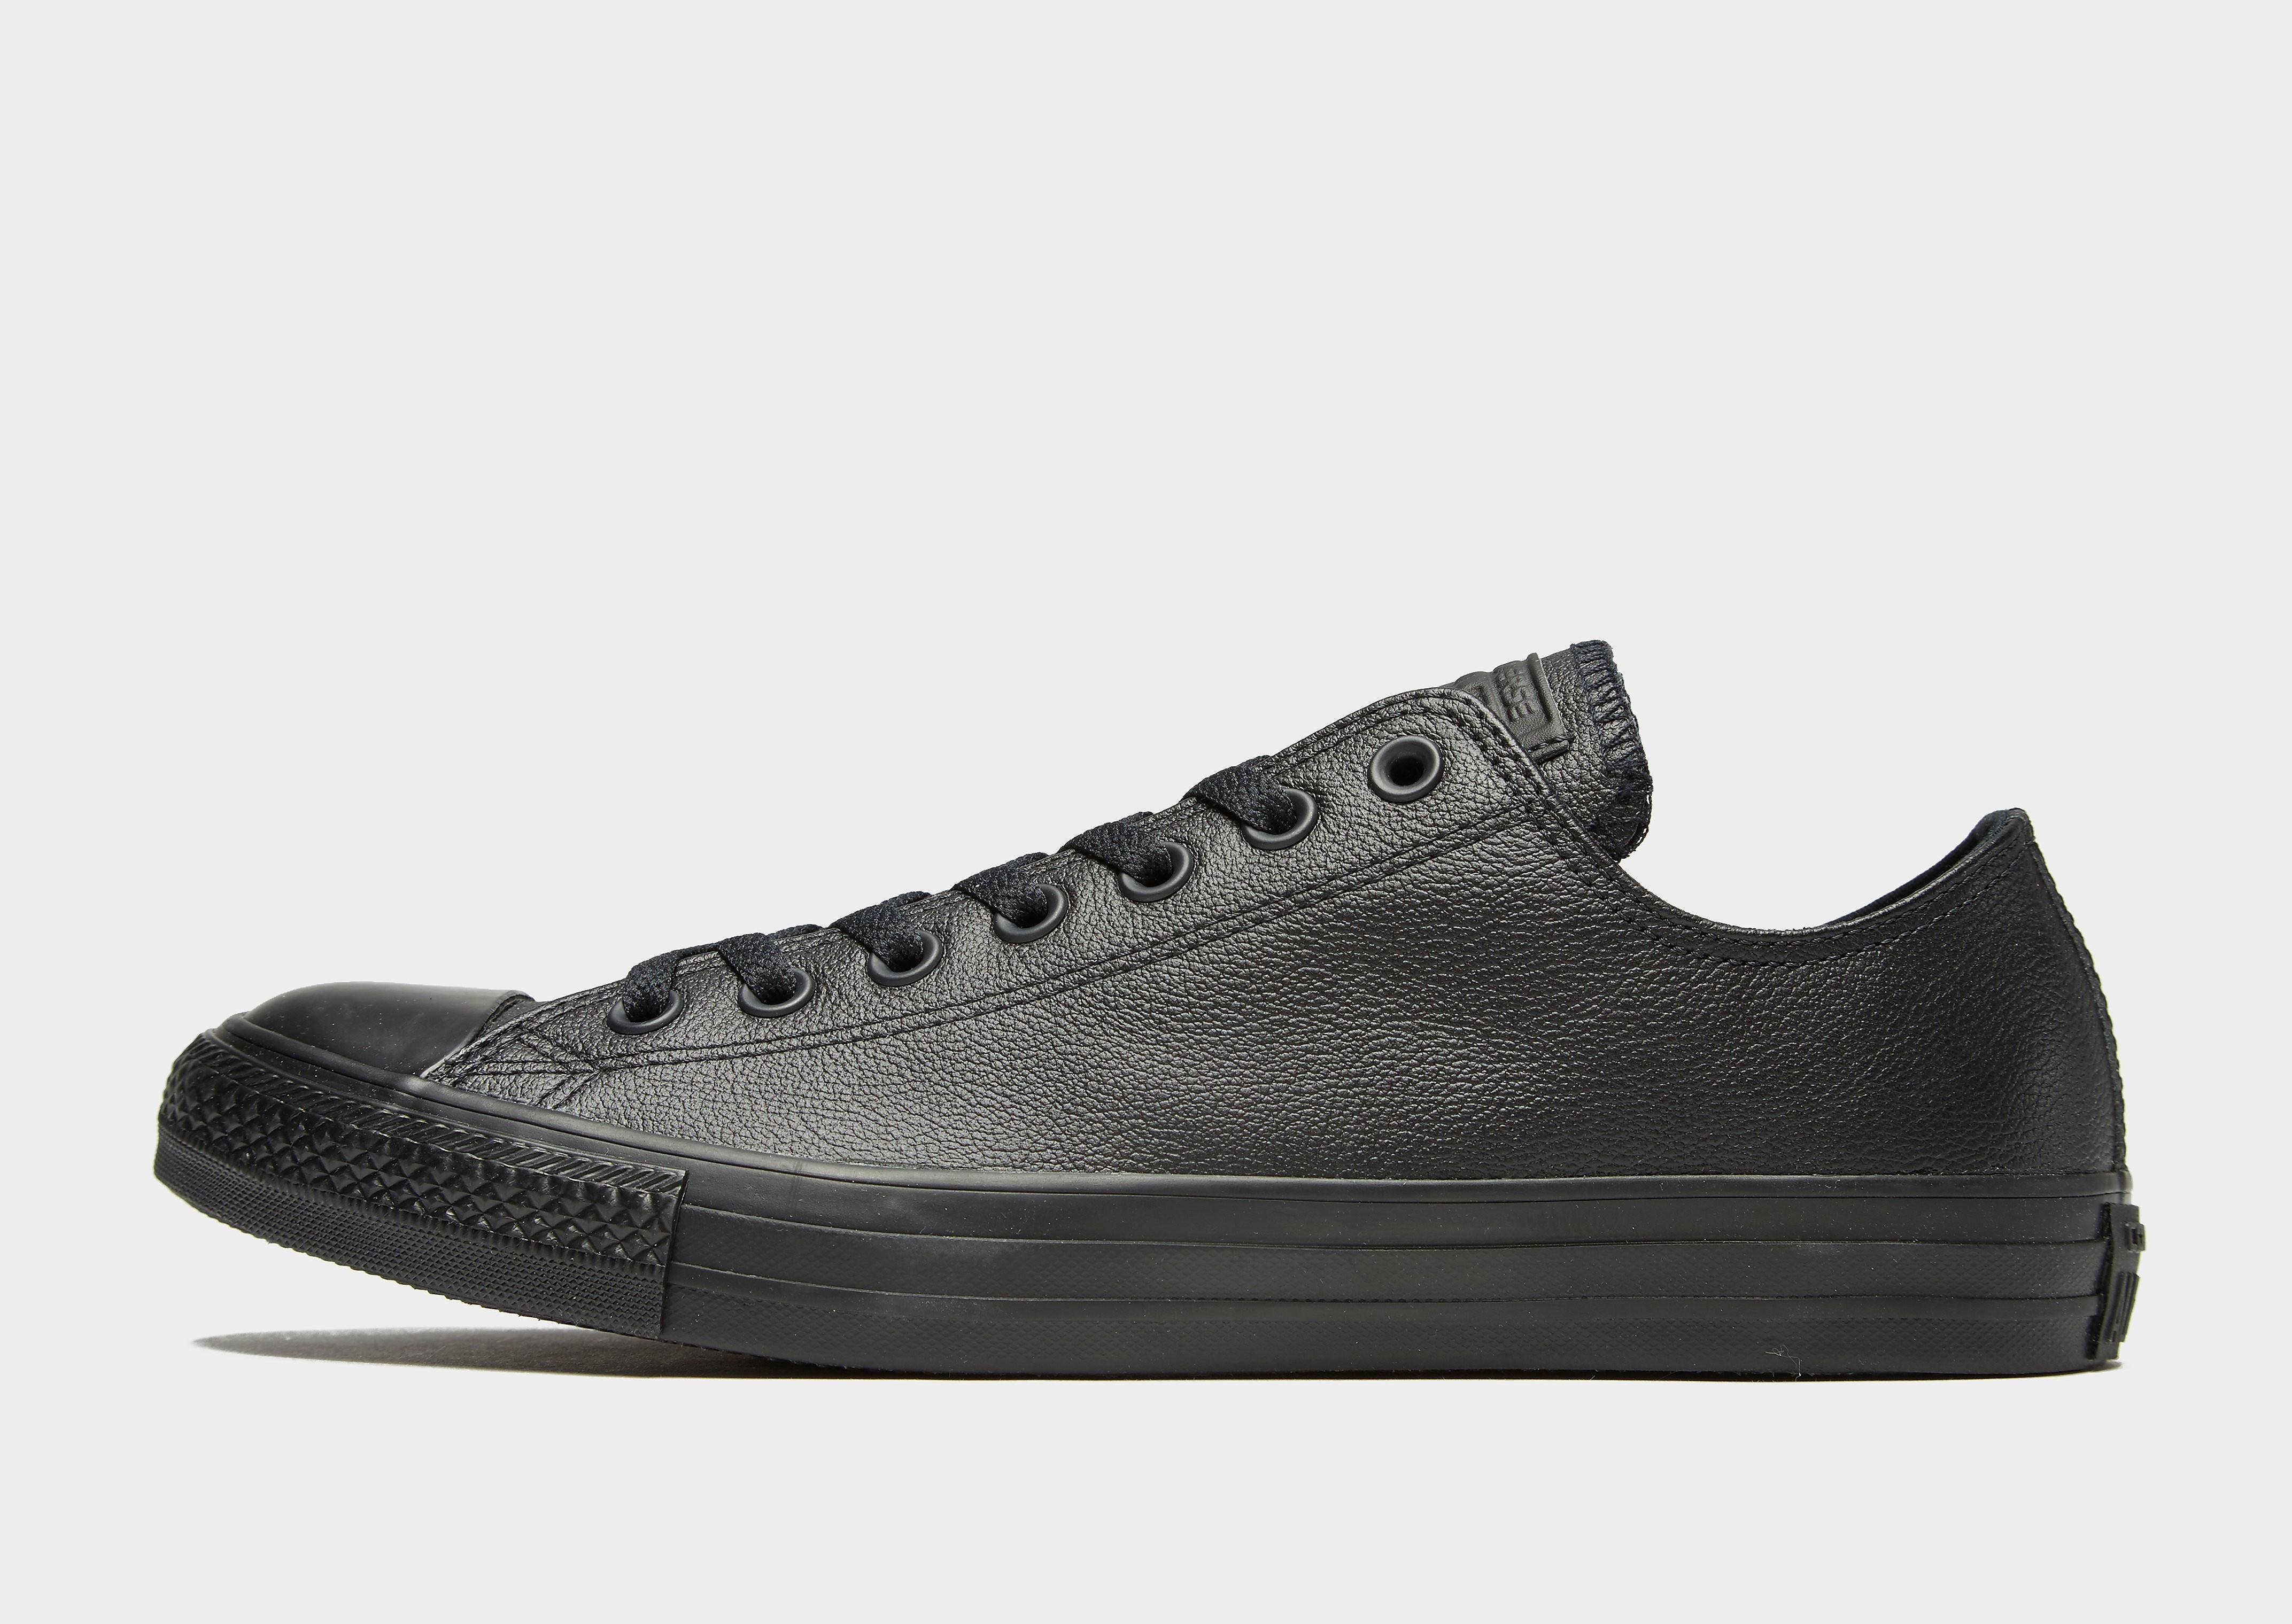 Converse All Star Ox Leather Mono - Zwart - Heren